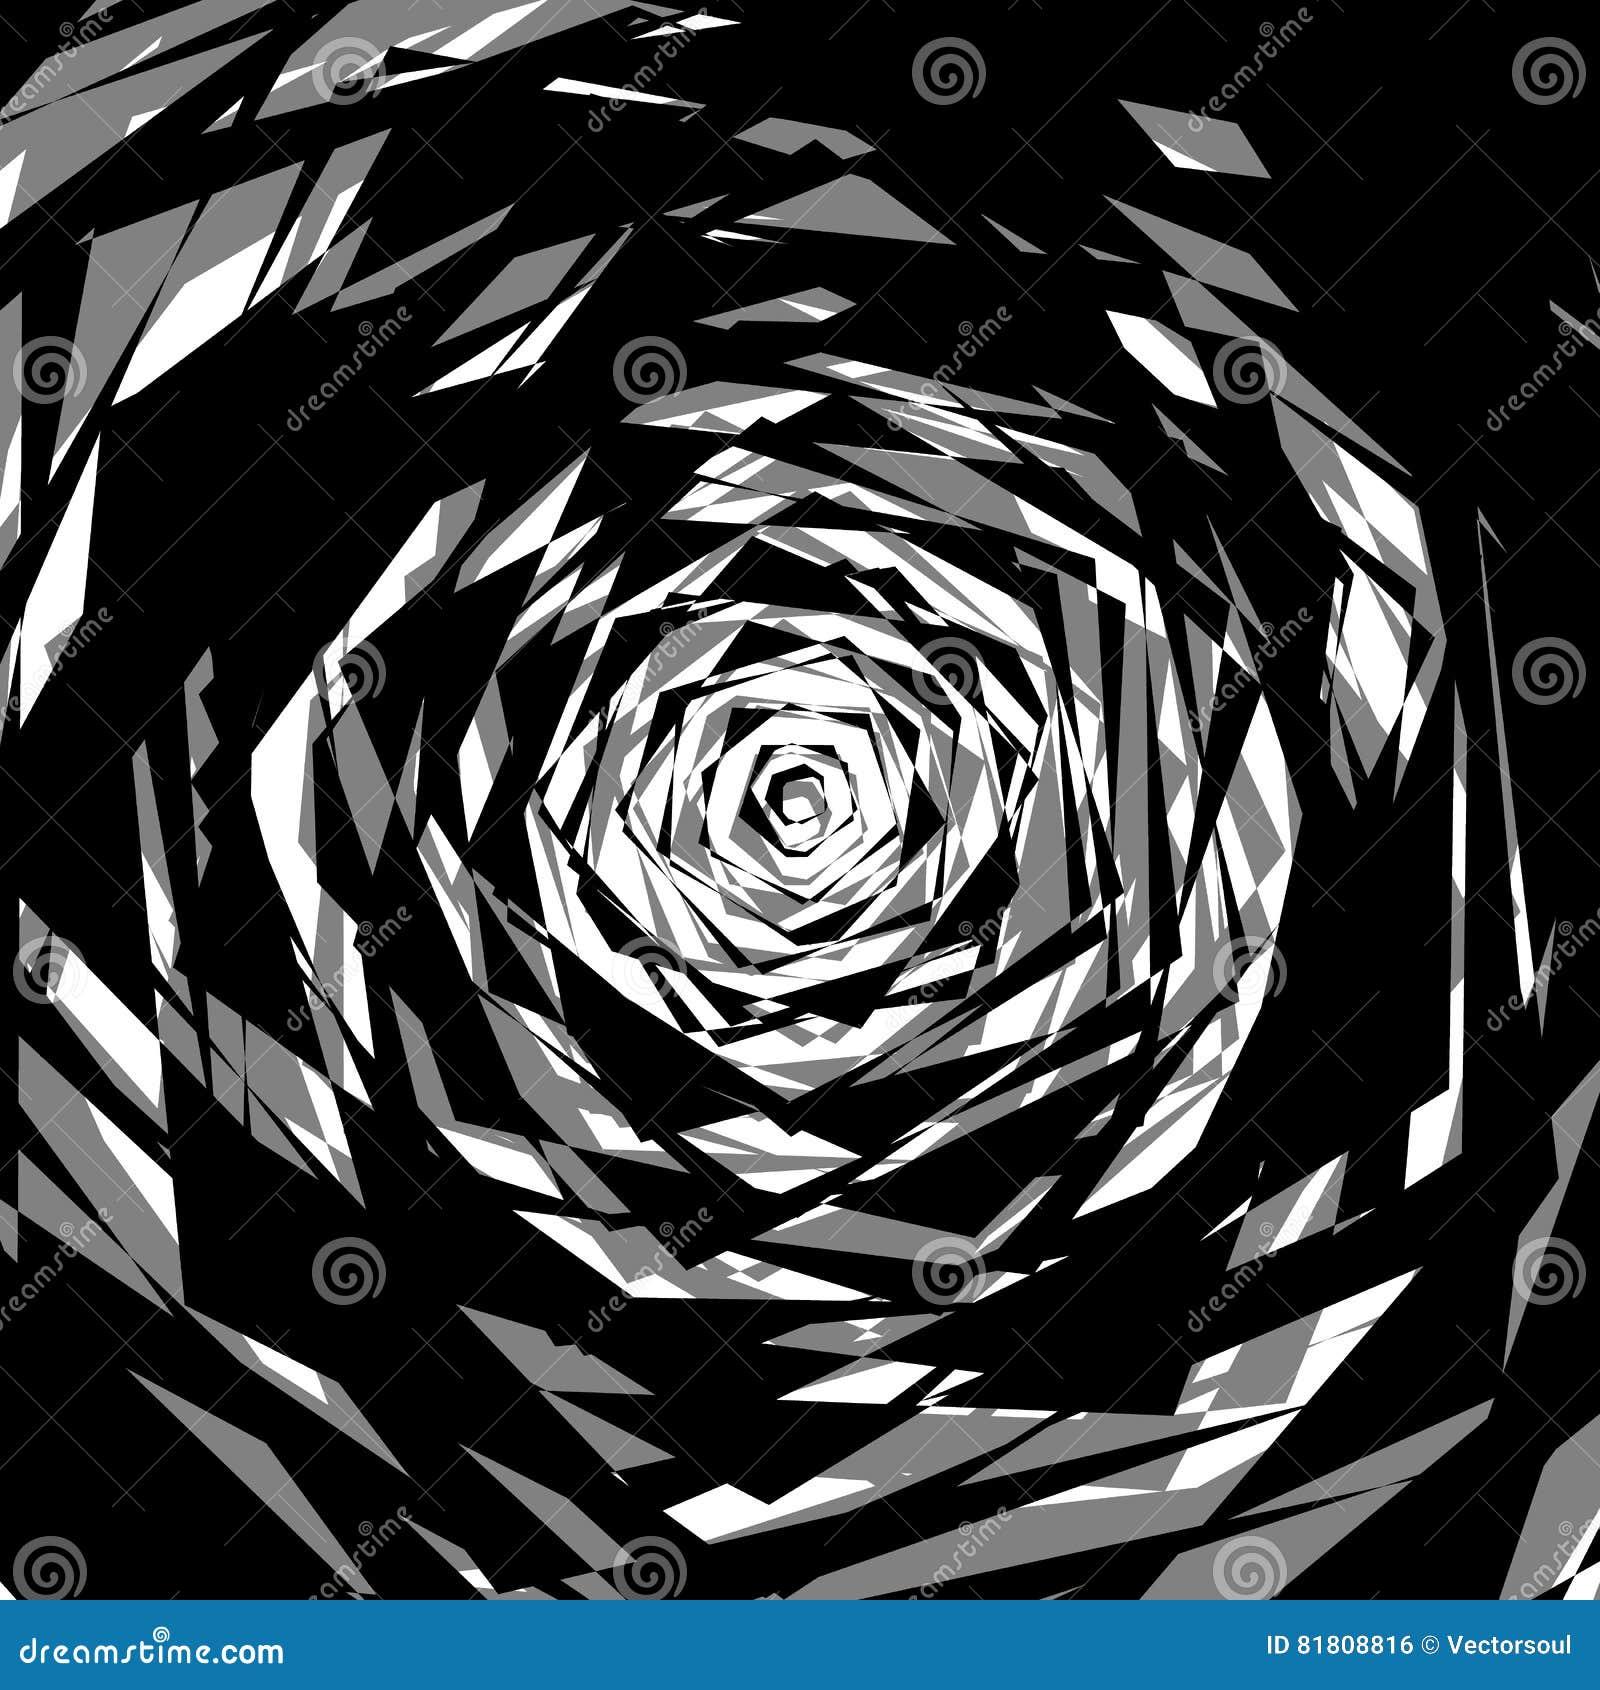 Бесцветная абстрактная нервная иллюстрация, грубая monochrome текстура